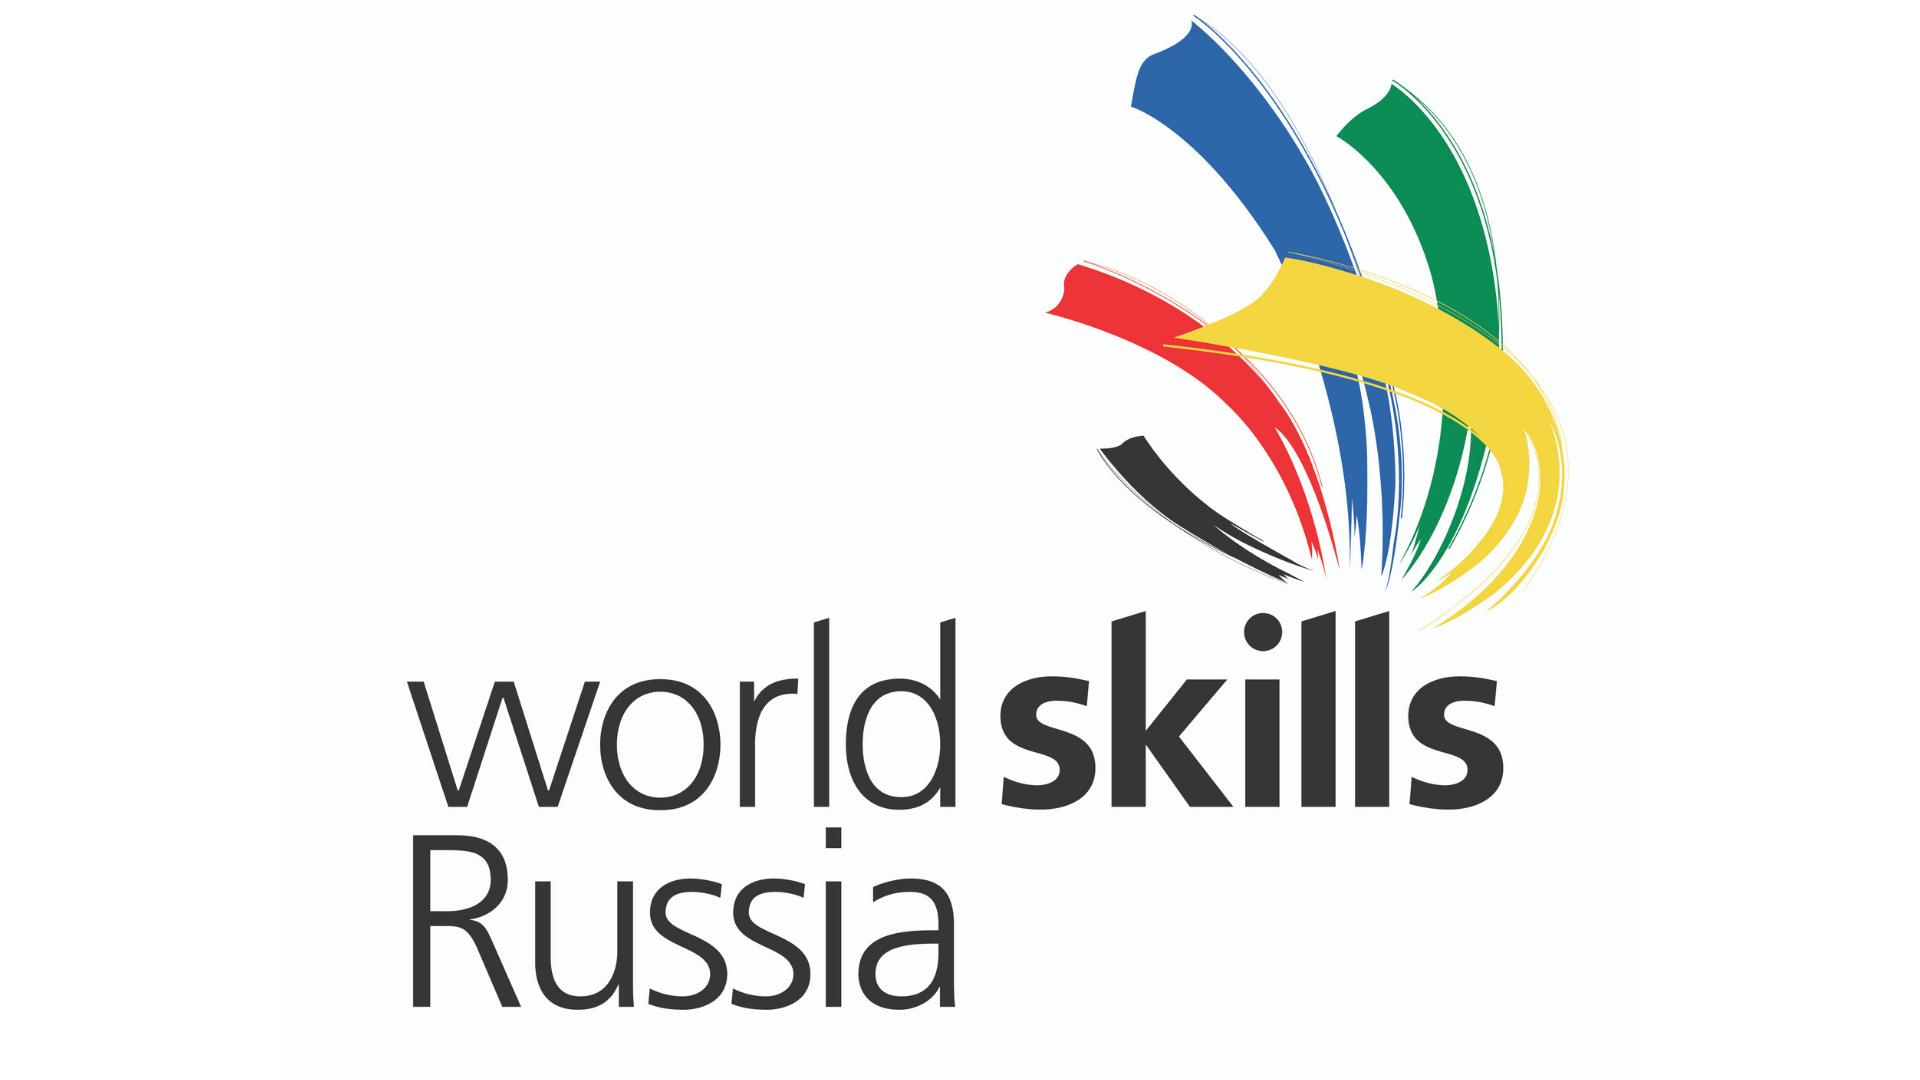 WorldSkills Russia 2018